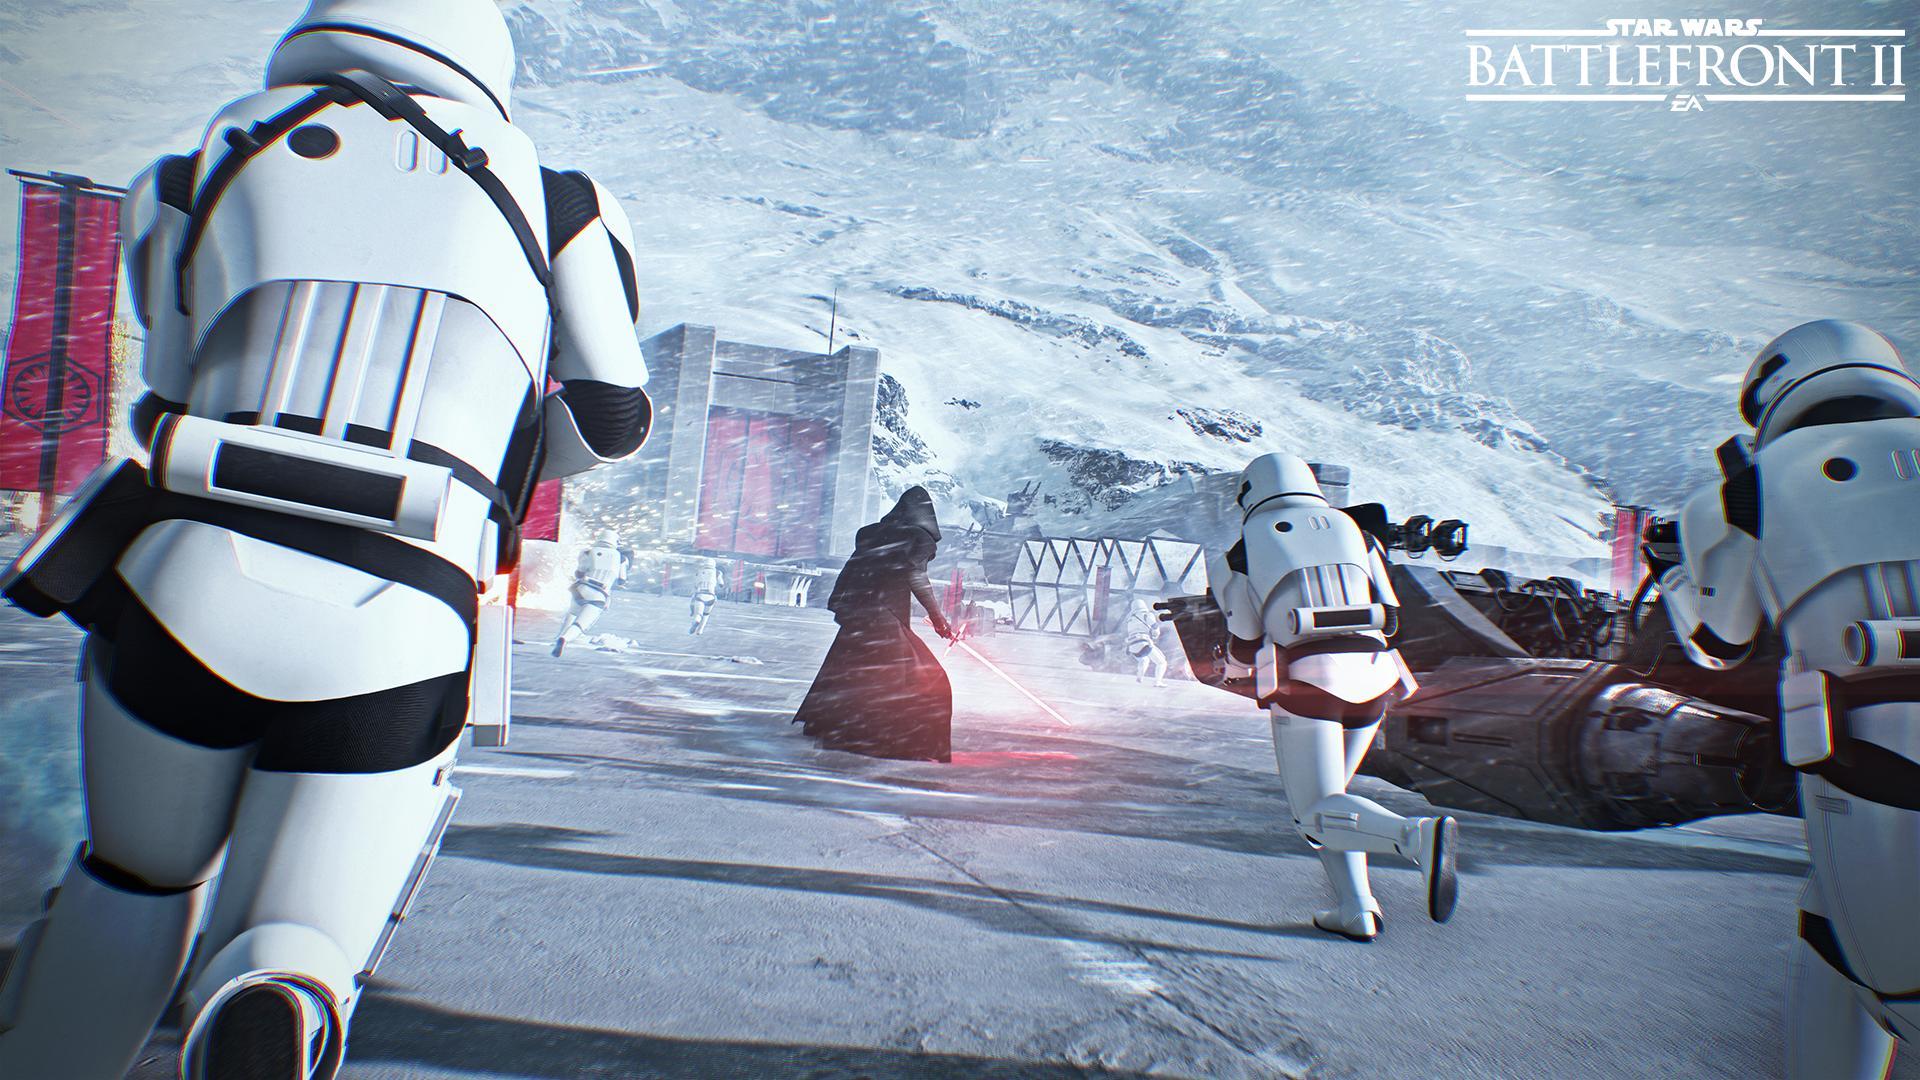 Luke Skywalker 'significantly important' in 'Star Wars